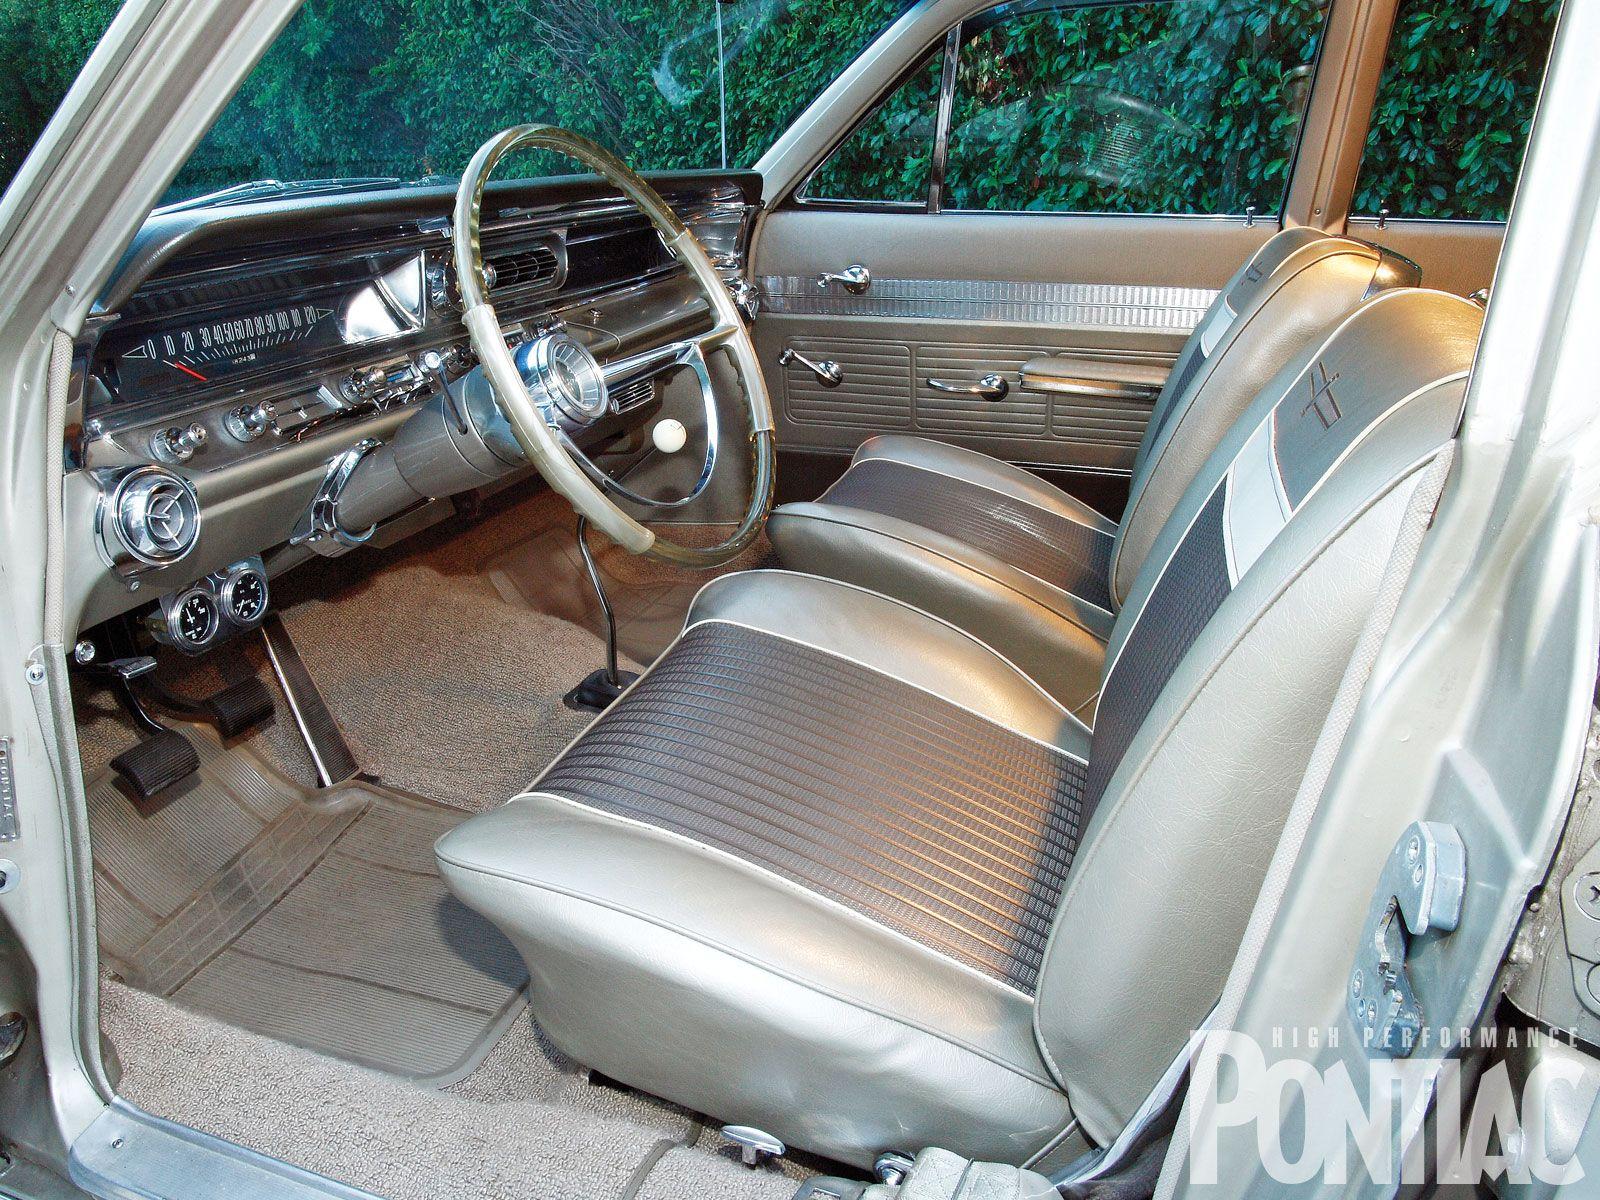 1963 pontiac catalina safari station wagon interior